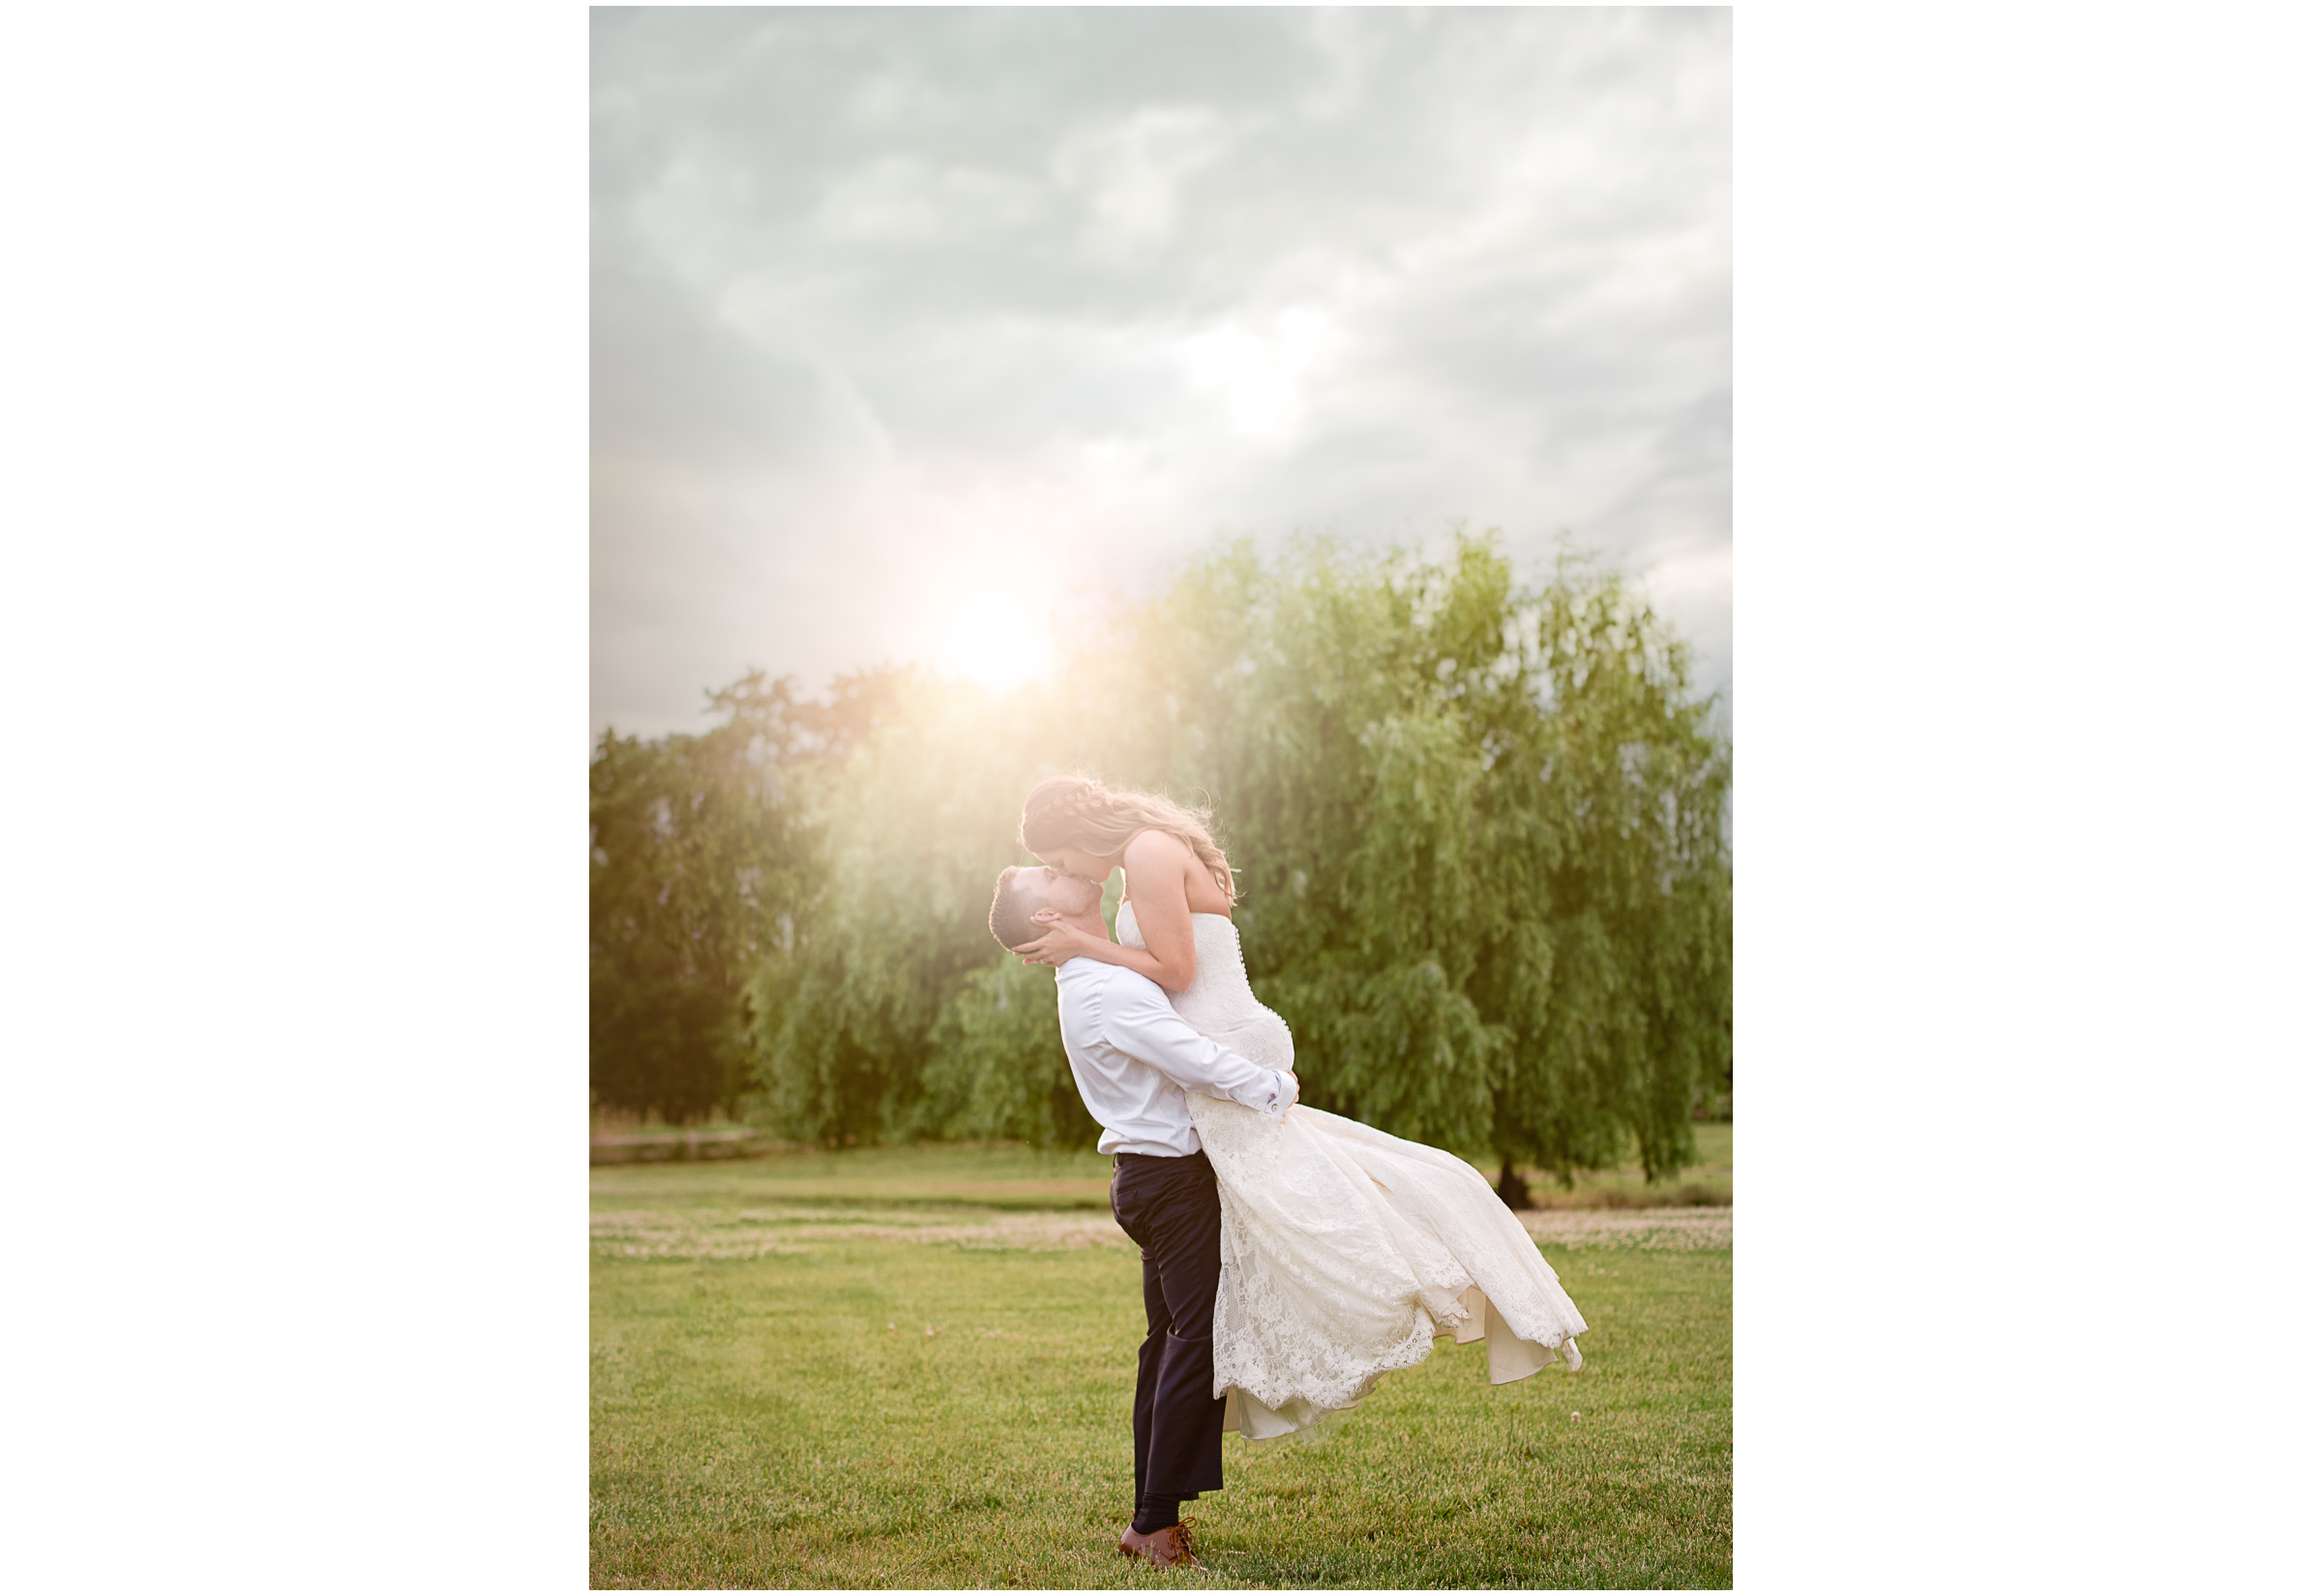 Winters Wedding - Sacramento Photographer - Field & Pond - Justin Wilcox Photography - 36.jpg